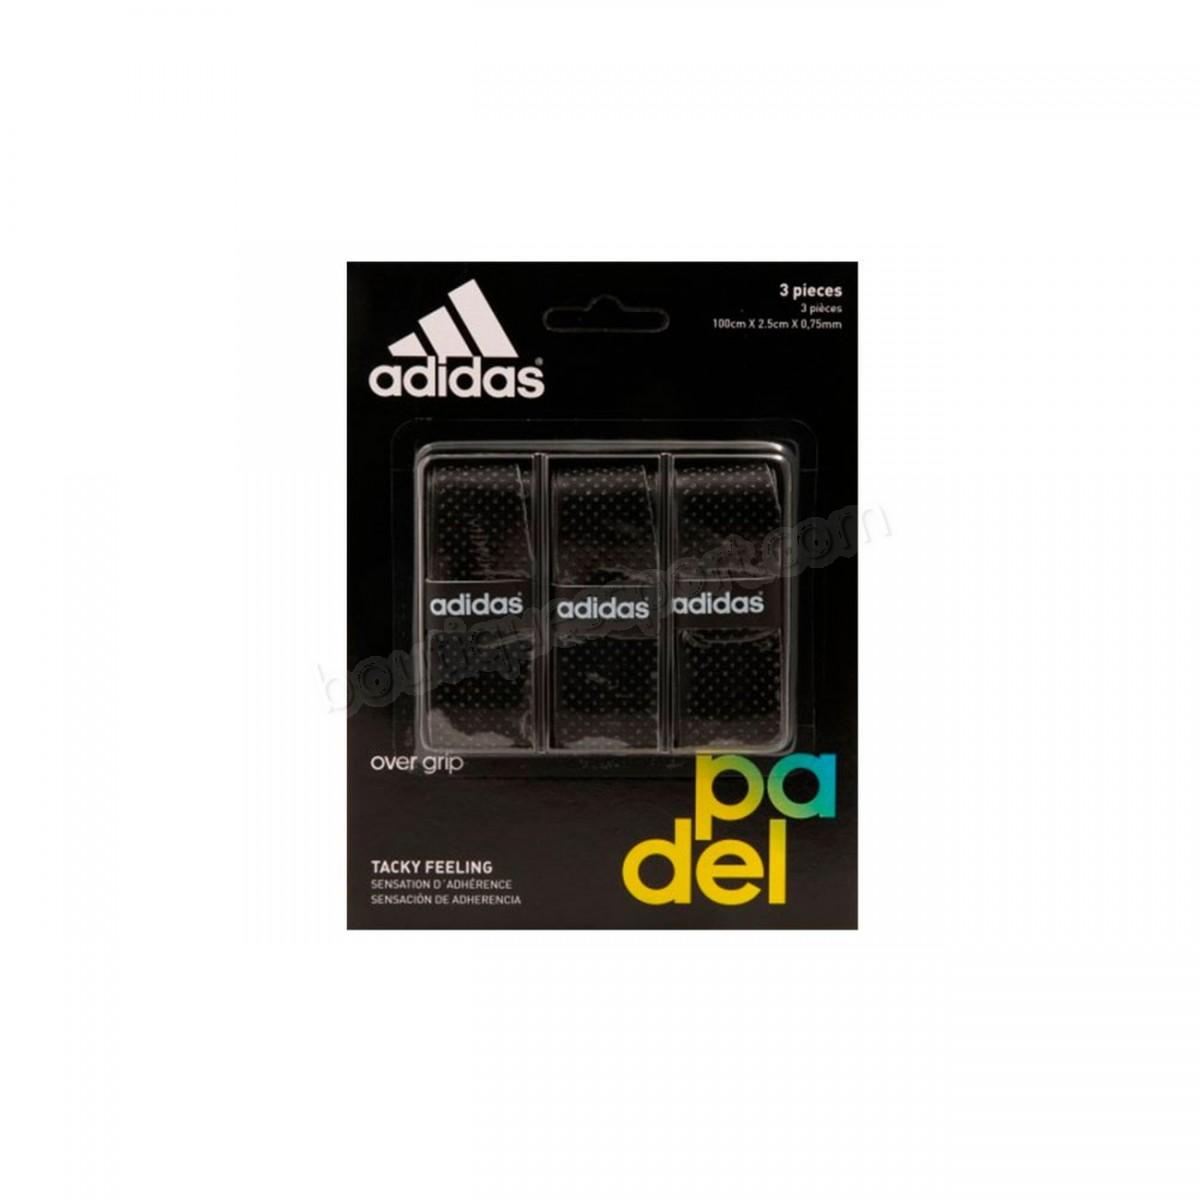 Tennis adulte ADIDAS PADEL Adidas Padel Overgrip Soldes - -1